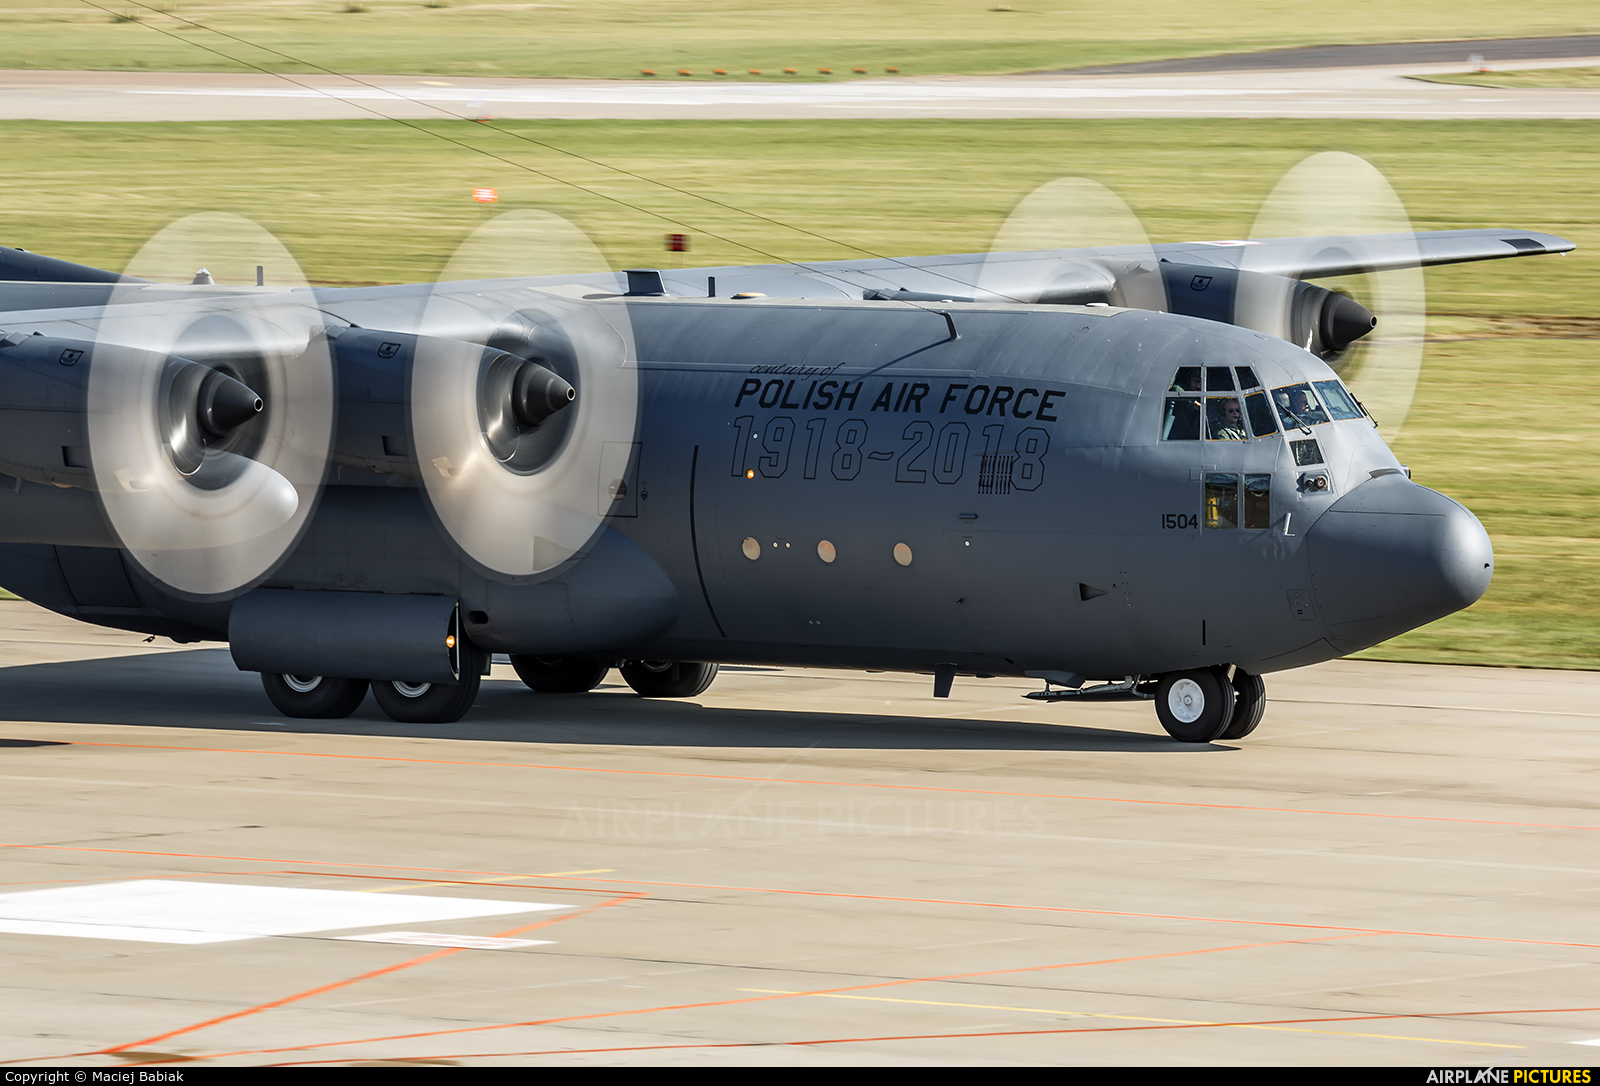 Poland - Air Force 1504 aircraft at Świdwin